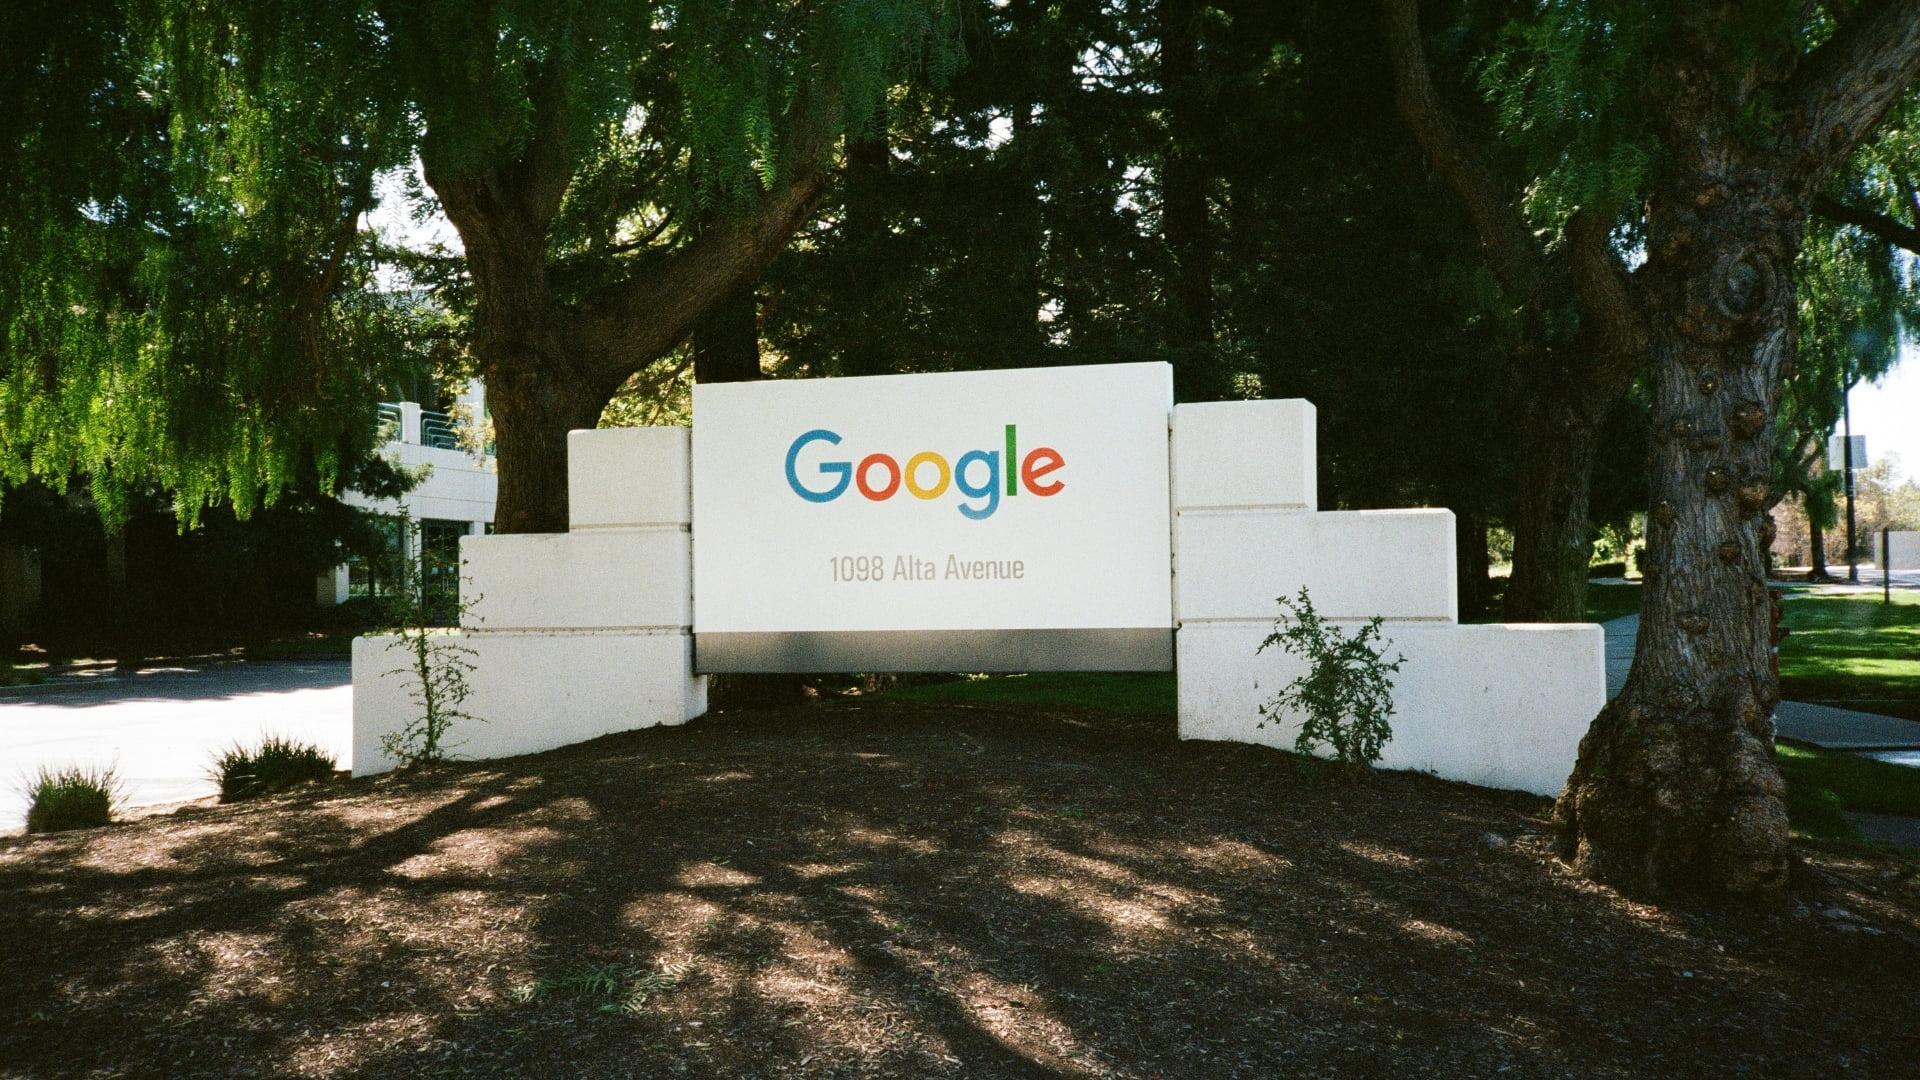 Google Developed APK